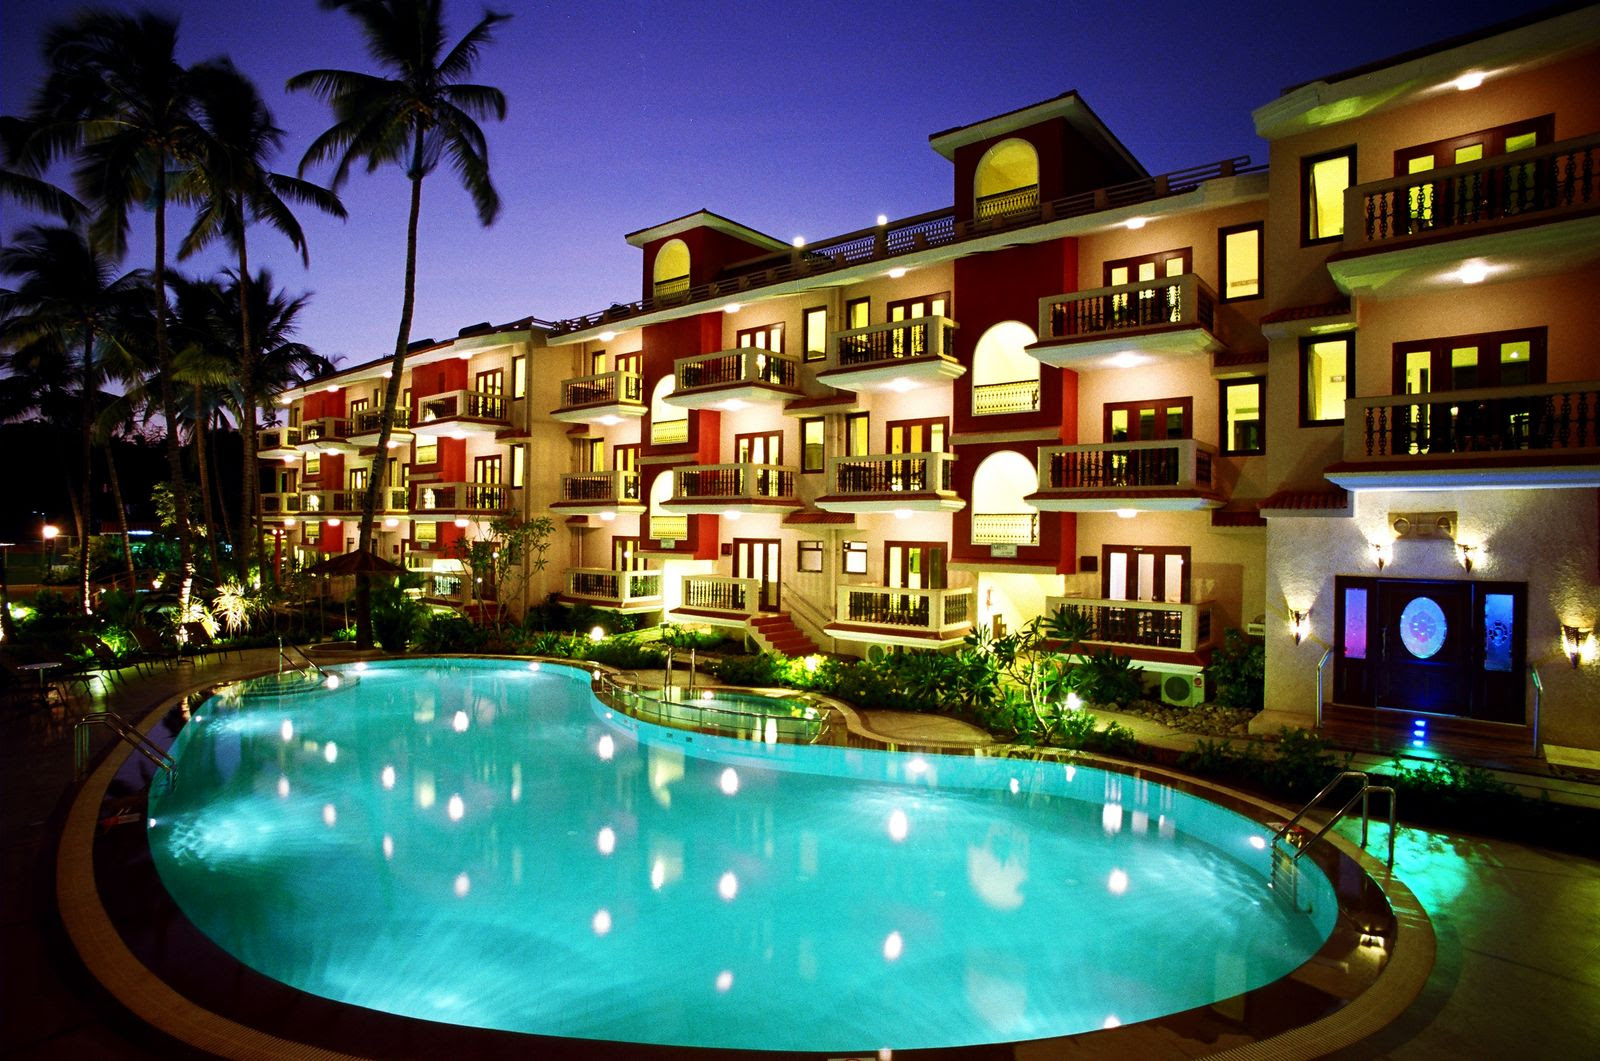 http://eduspiral.files.wordpress.com/2011/11/hotels.jpg